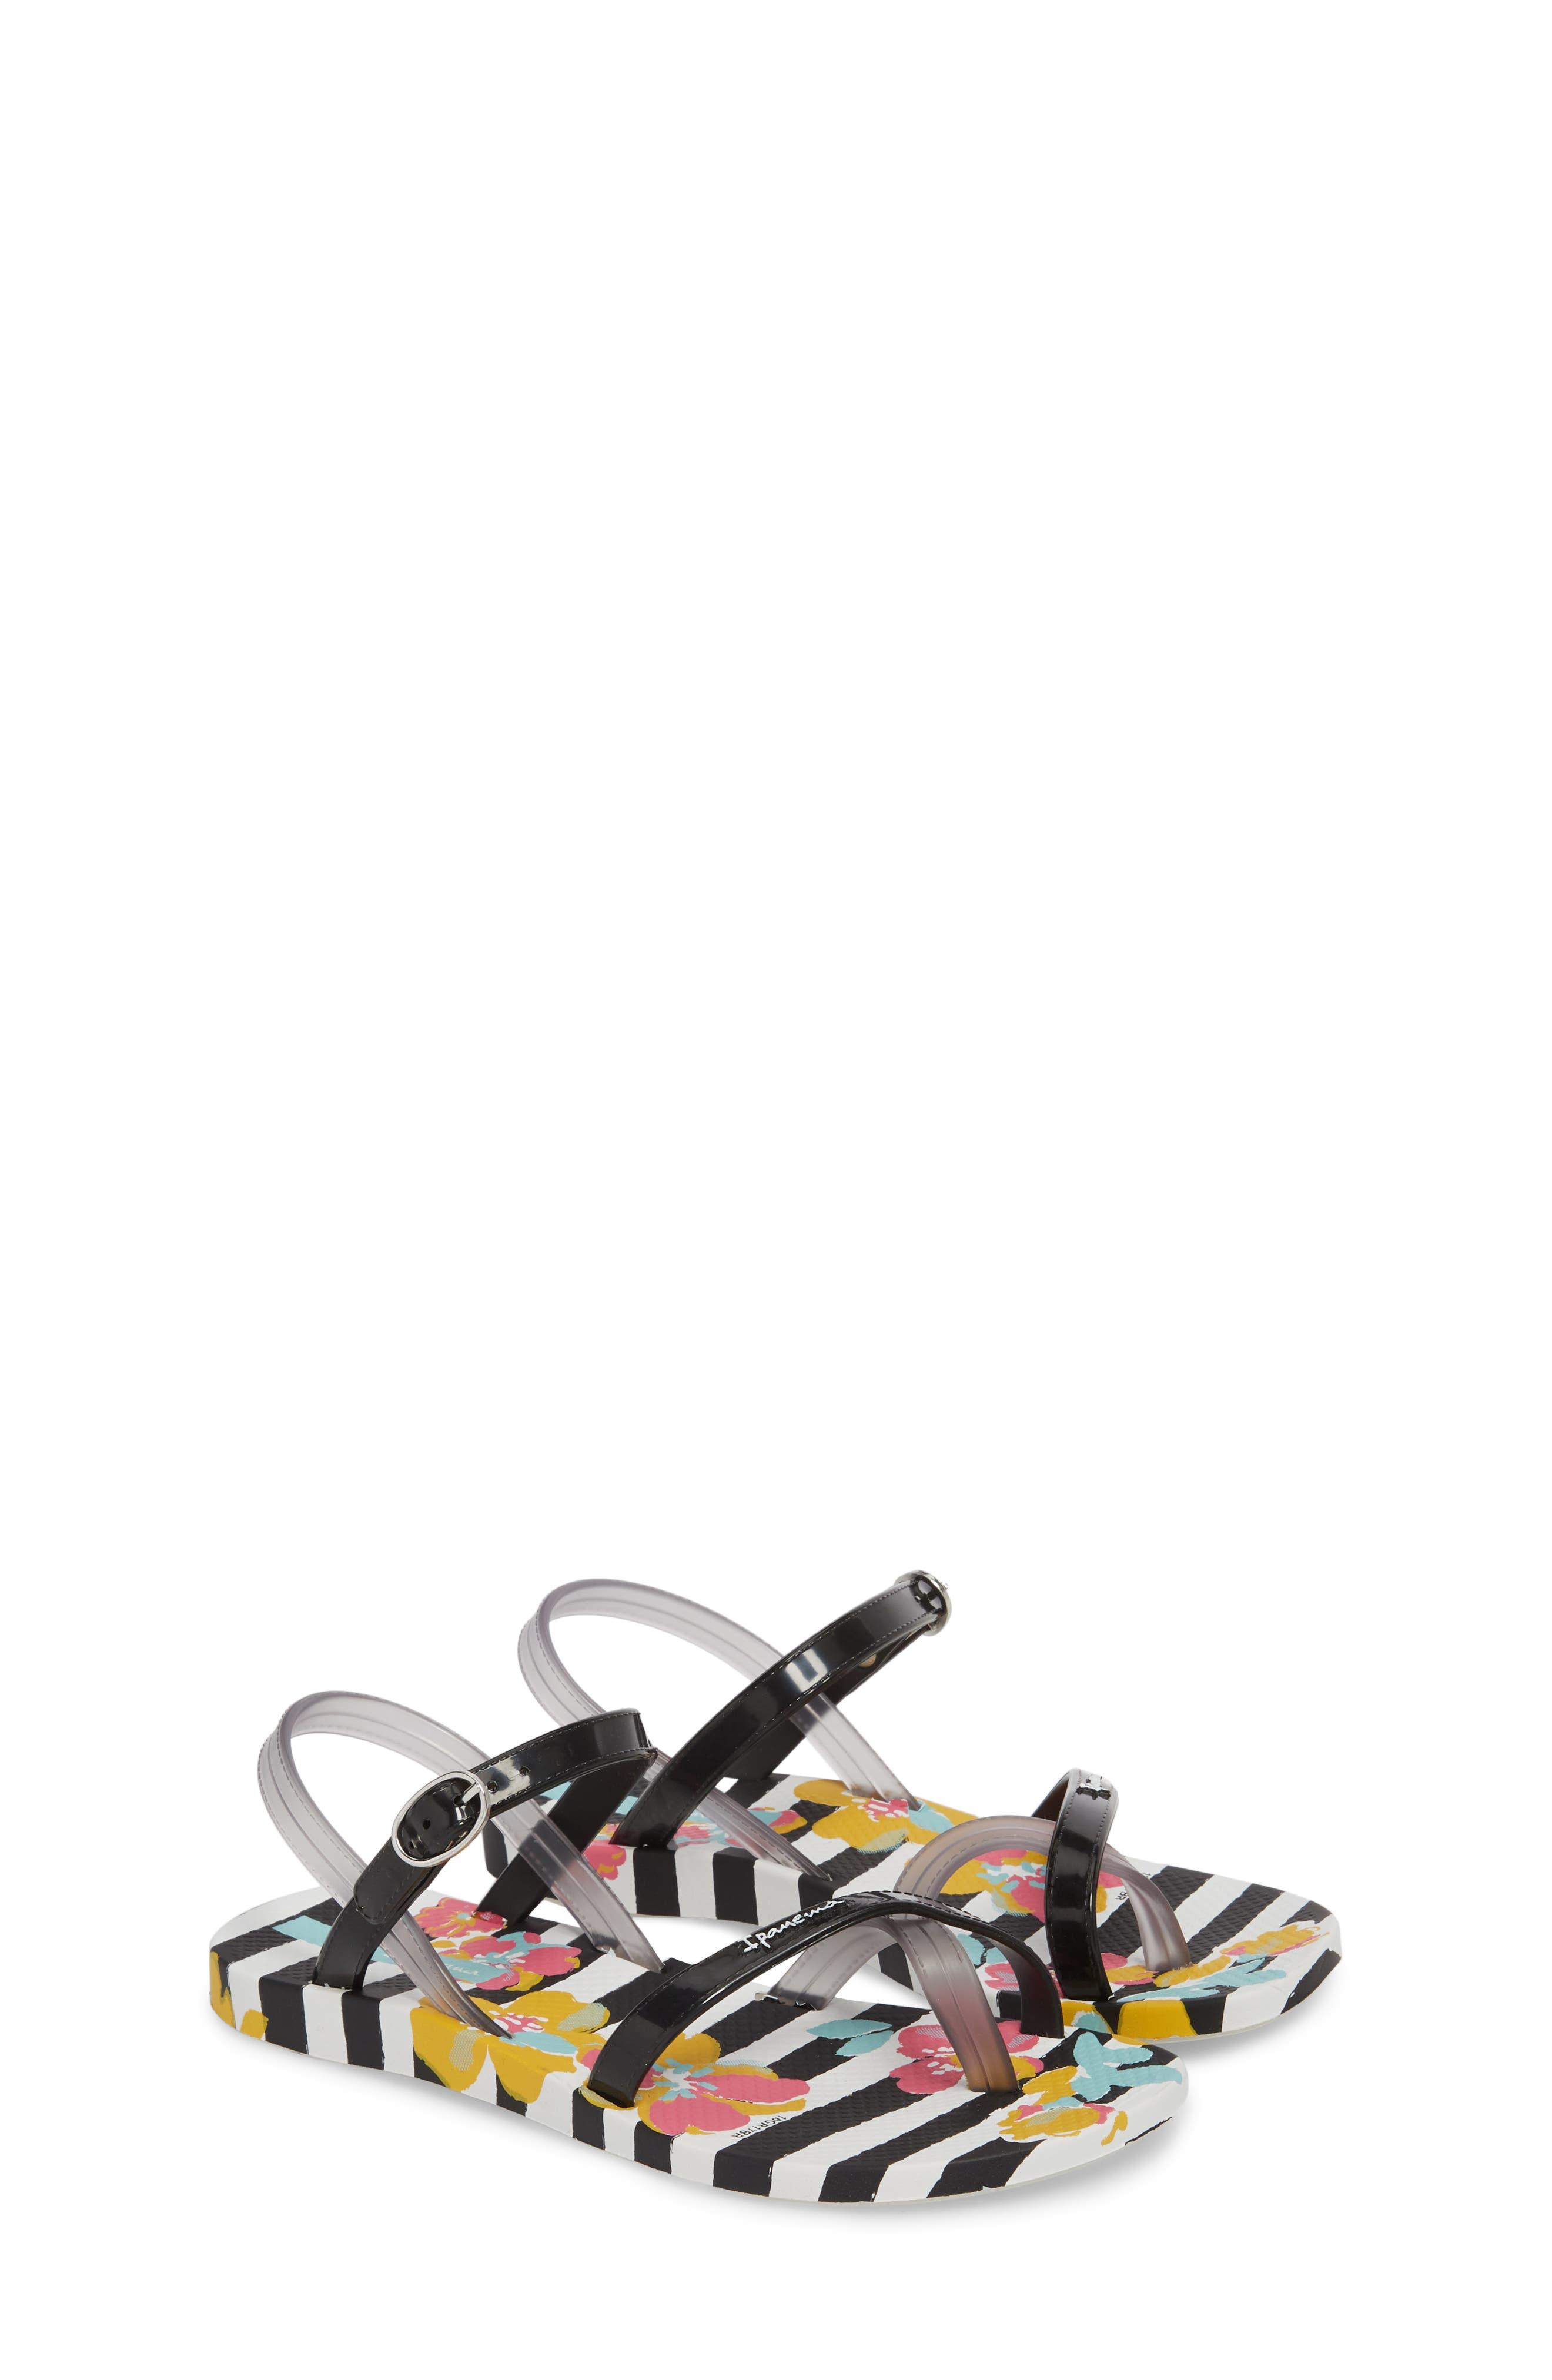 Toe Loop Sandal,                             Alternate thumbnail 3, color,                             White/ Black